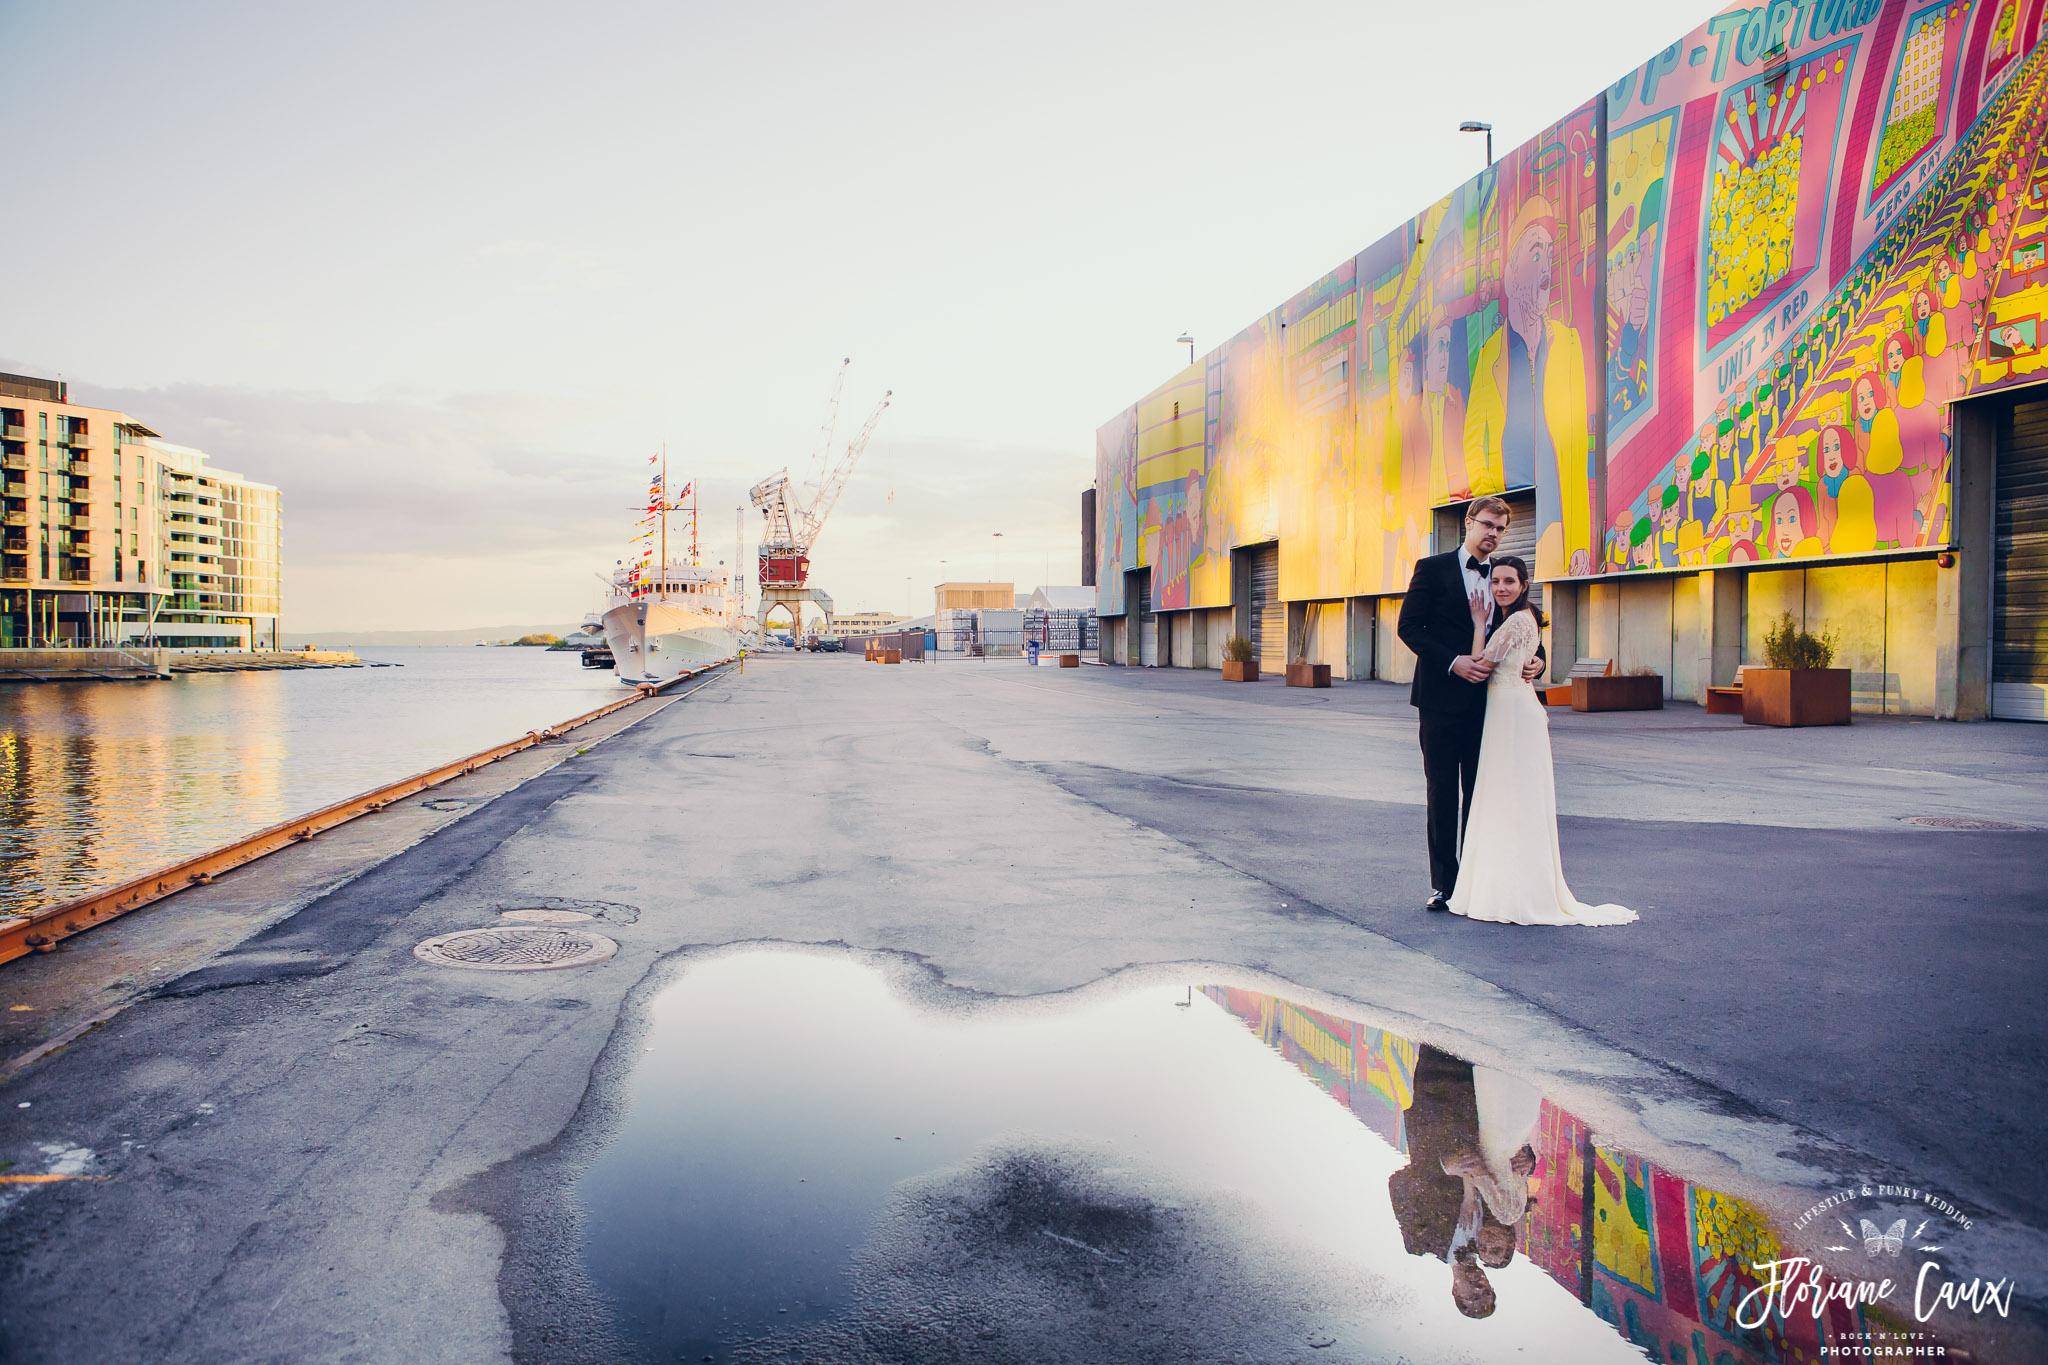 destination-wedding-photographer-oslo-norway-floriane-caux-42